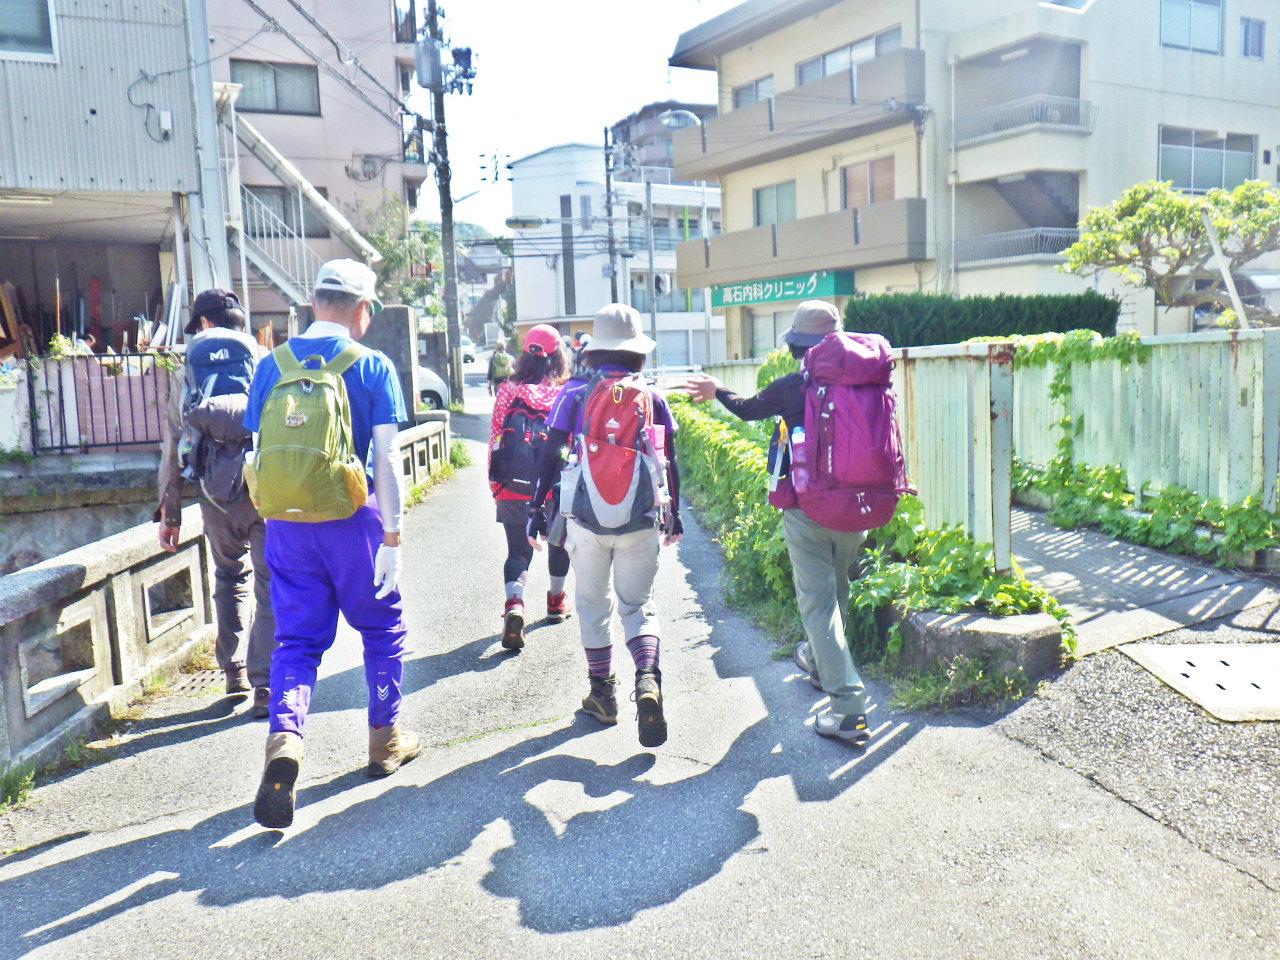 09b 高取山へ向かう